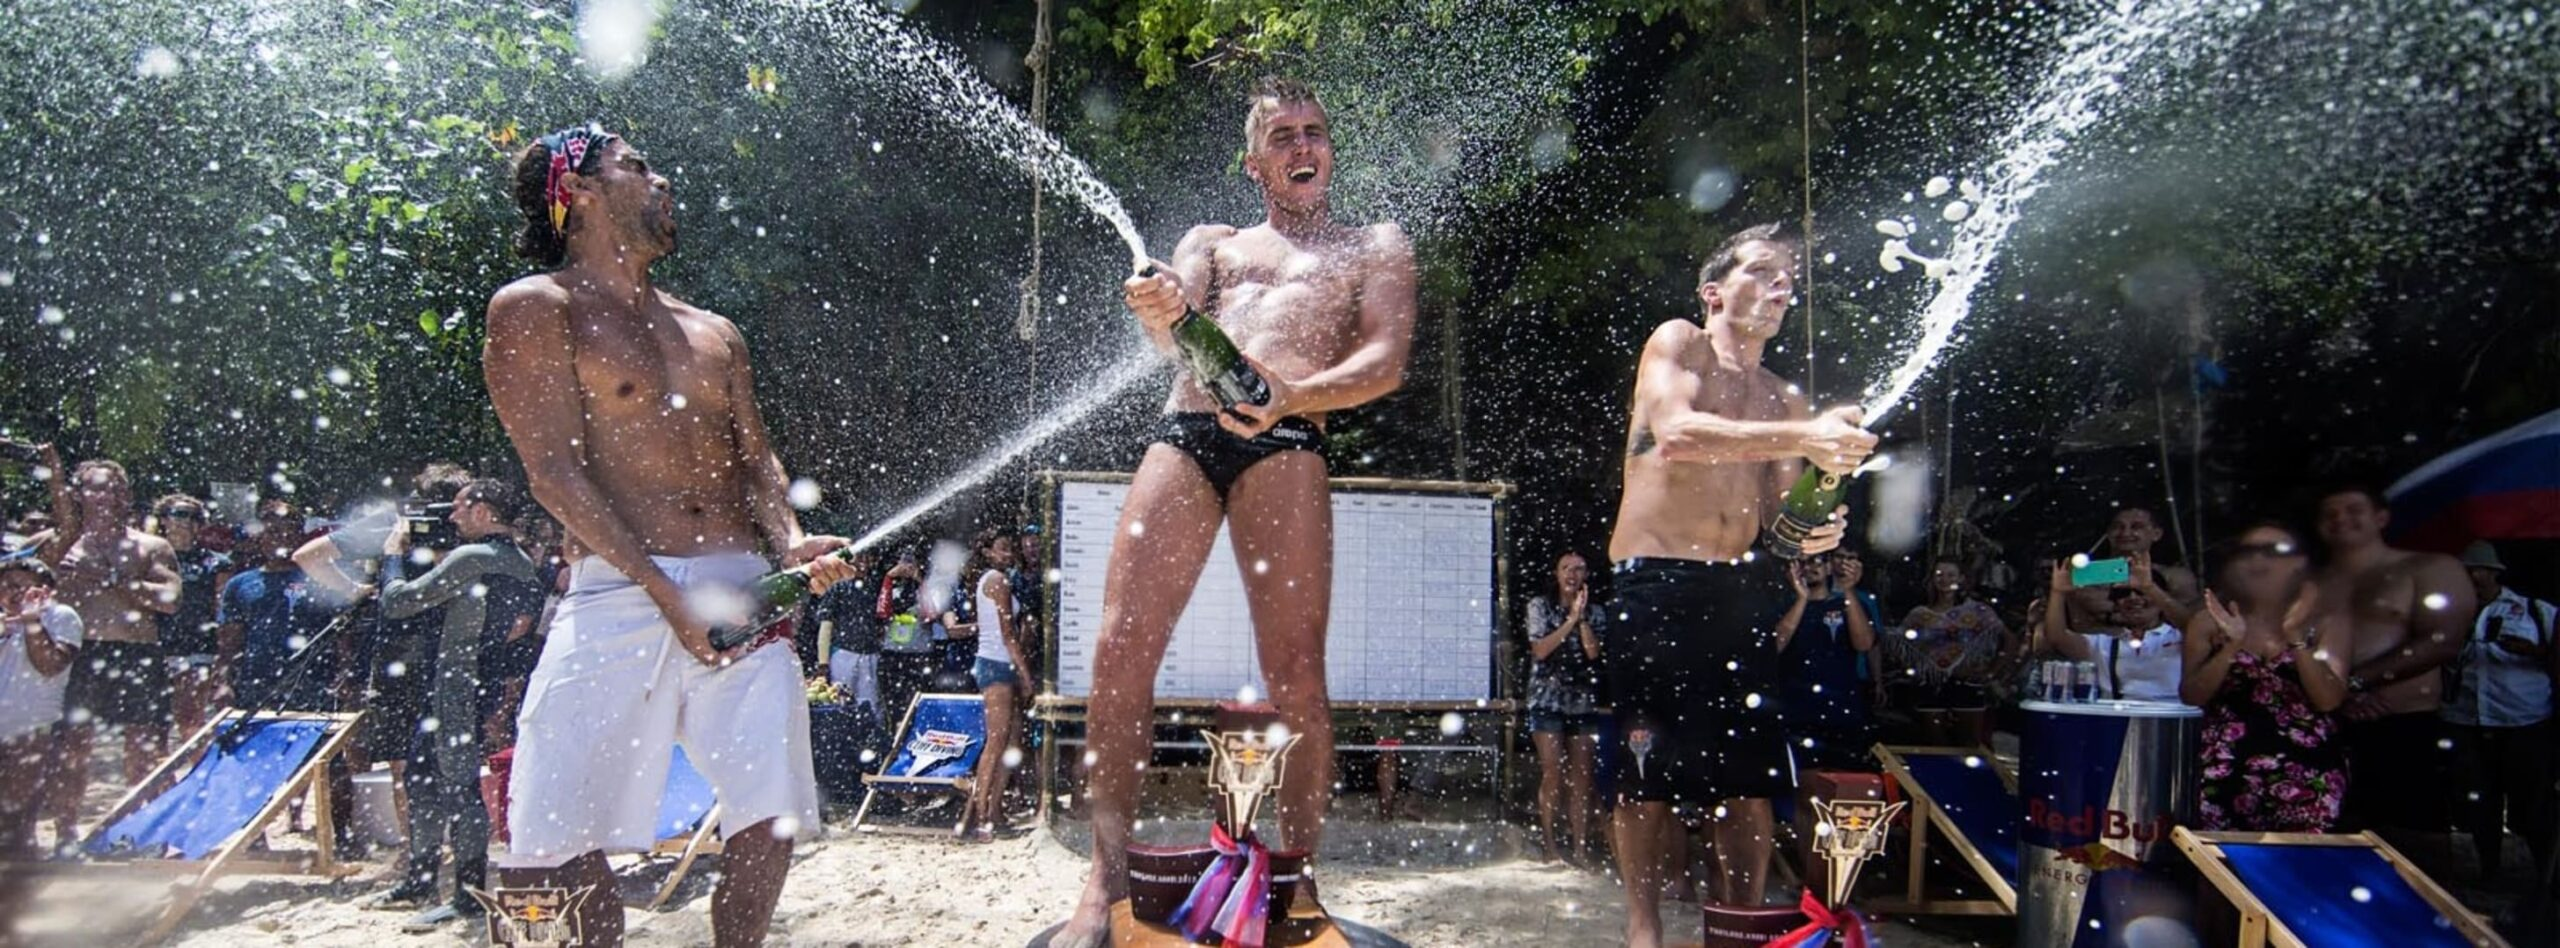 KRABI Red Bull Cliff Diving World Series champion.